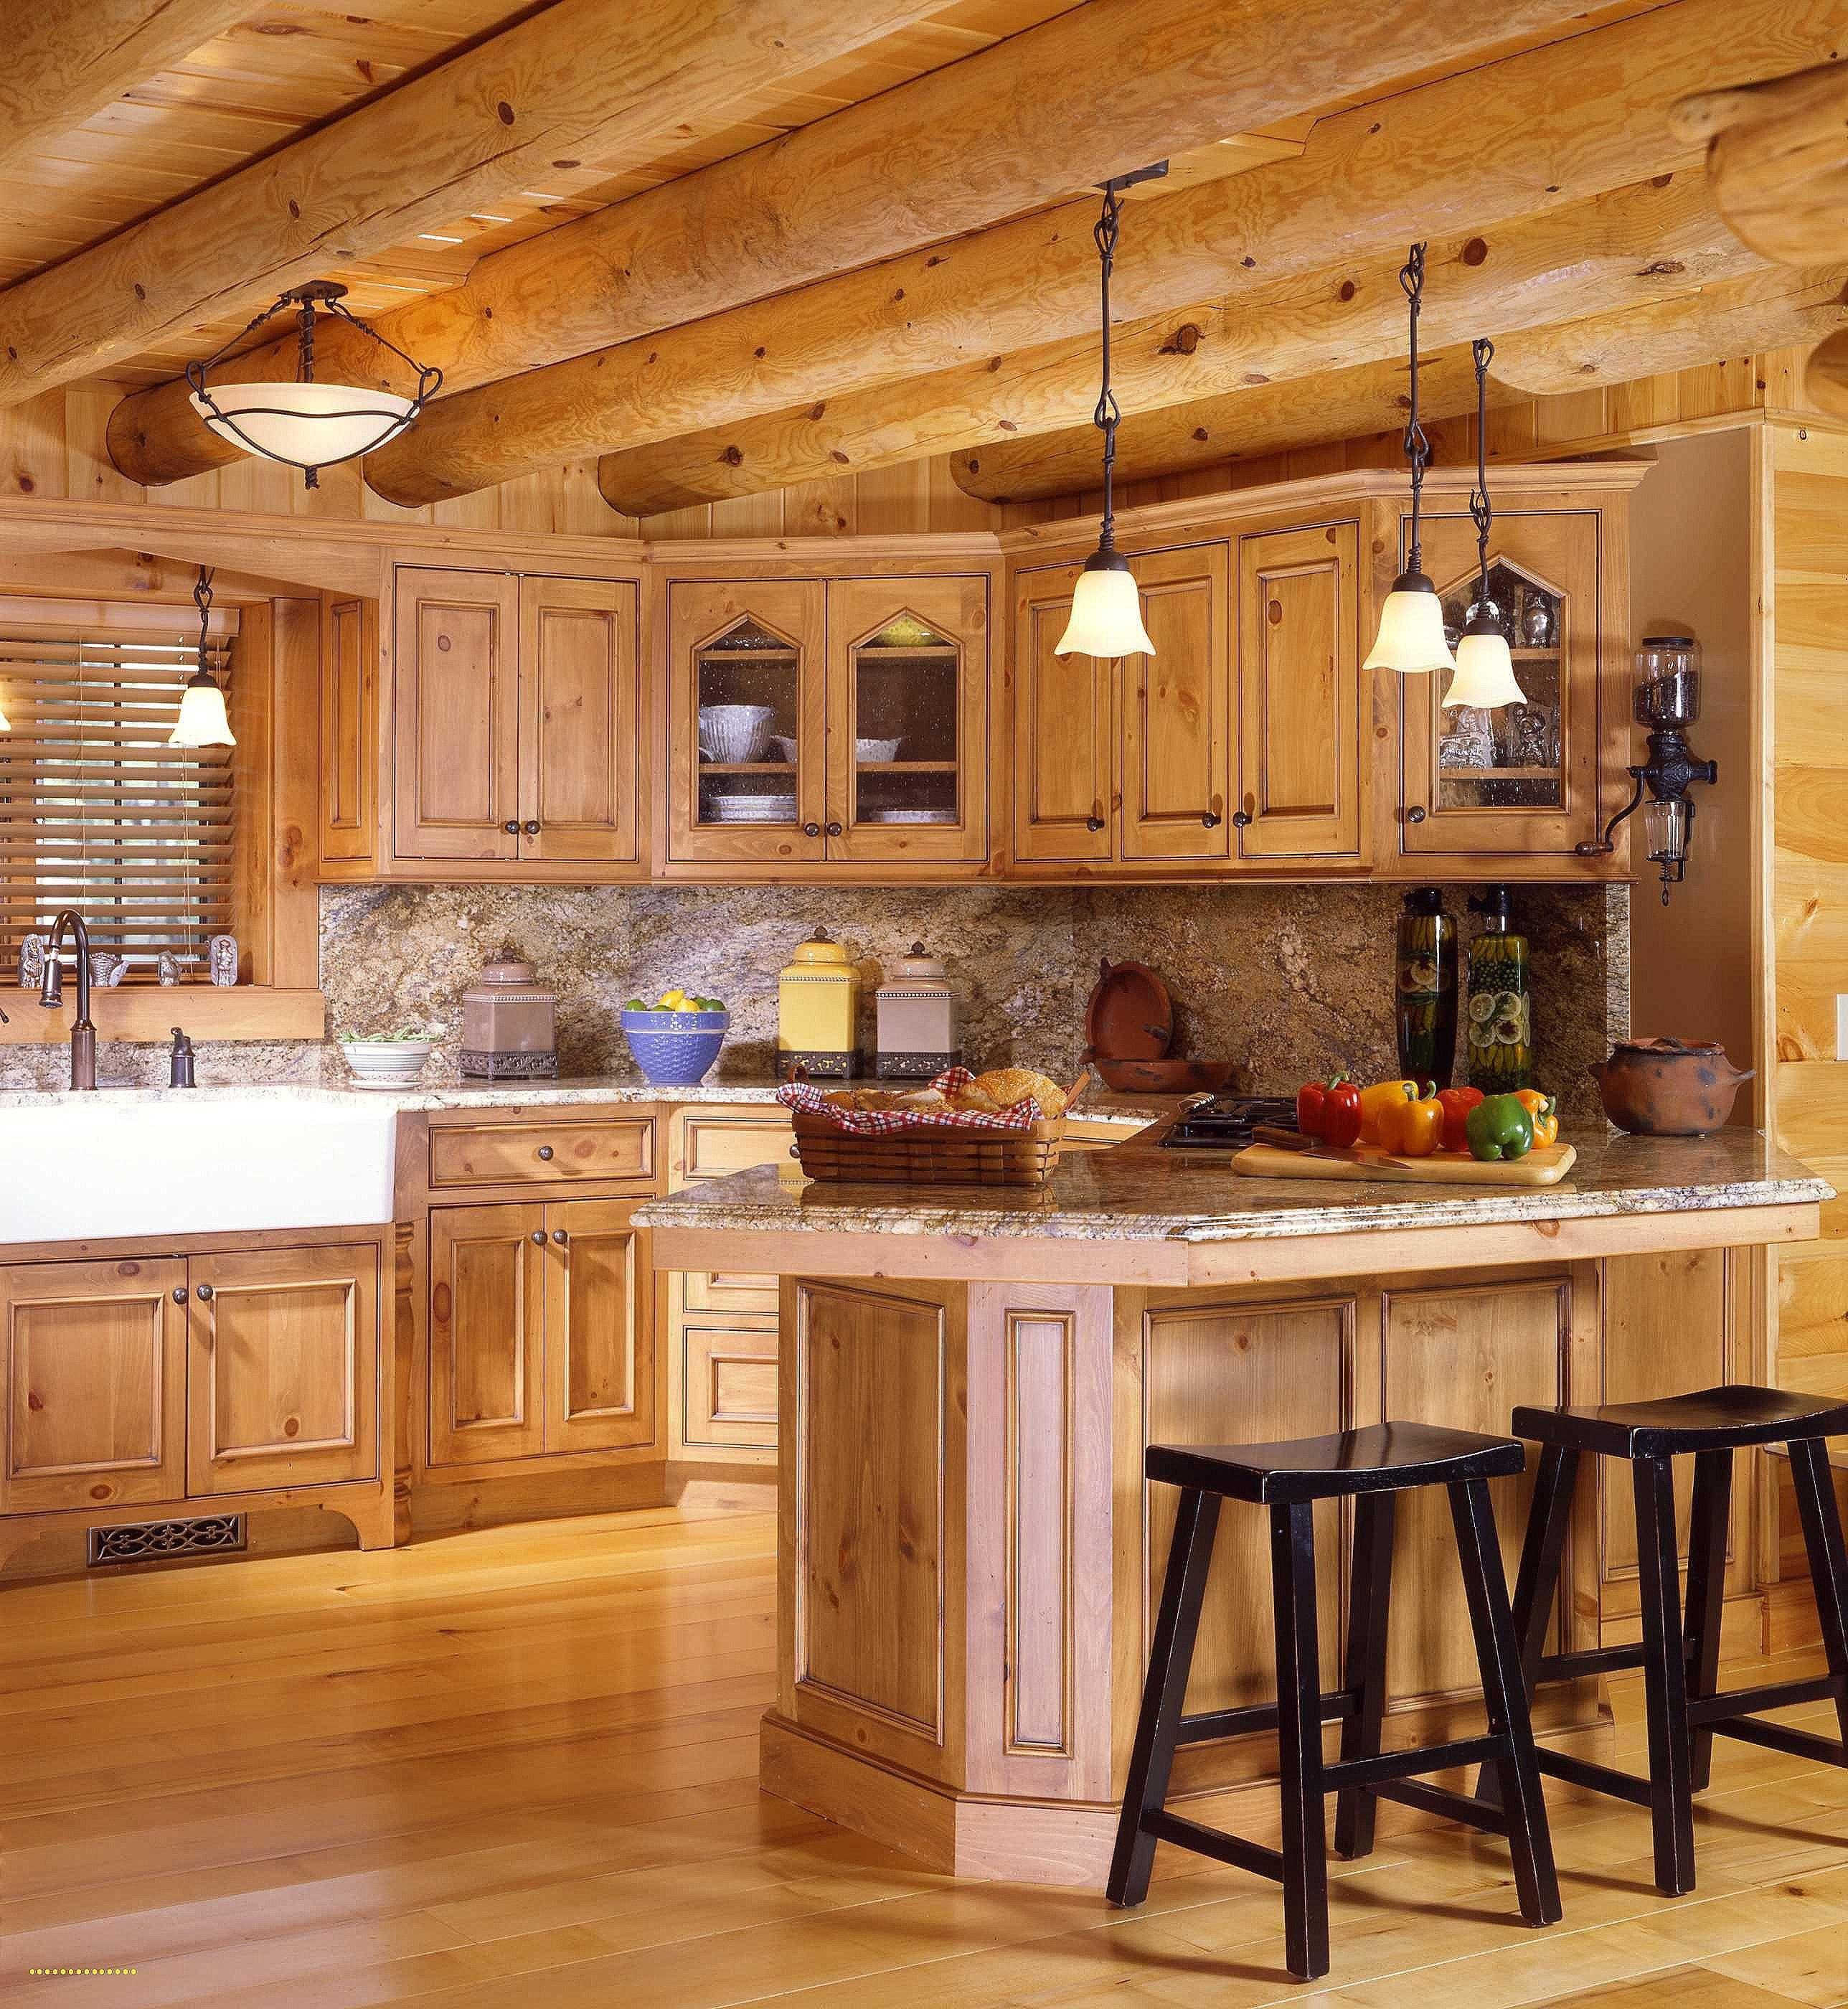 elegant cabin kitchen ideas log home kitchens log cabin kitchens log home decorating on kitchen ideas elegant id=42507